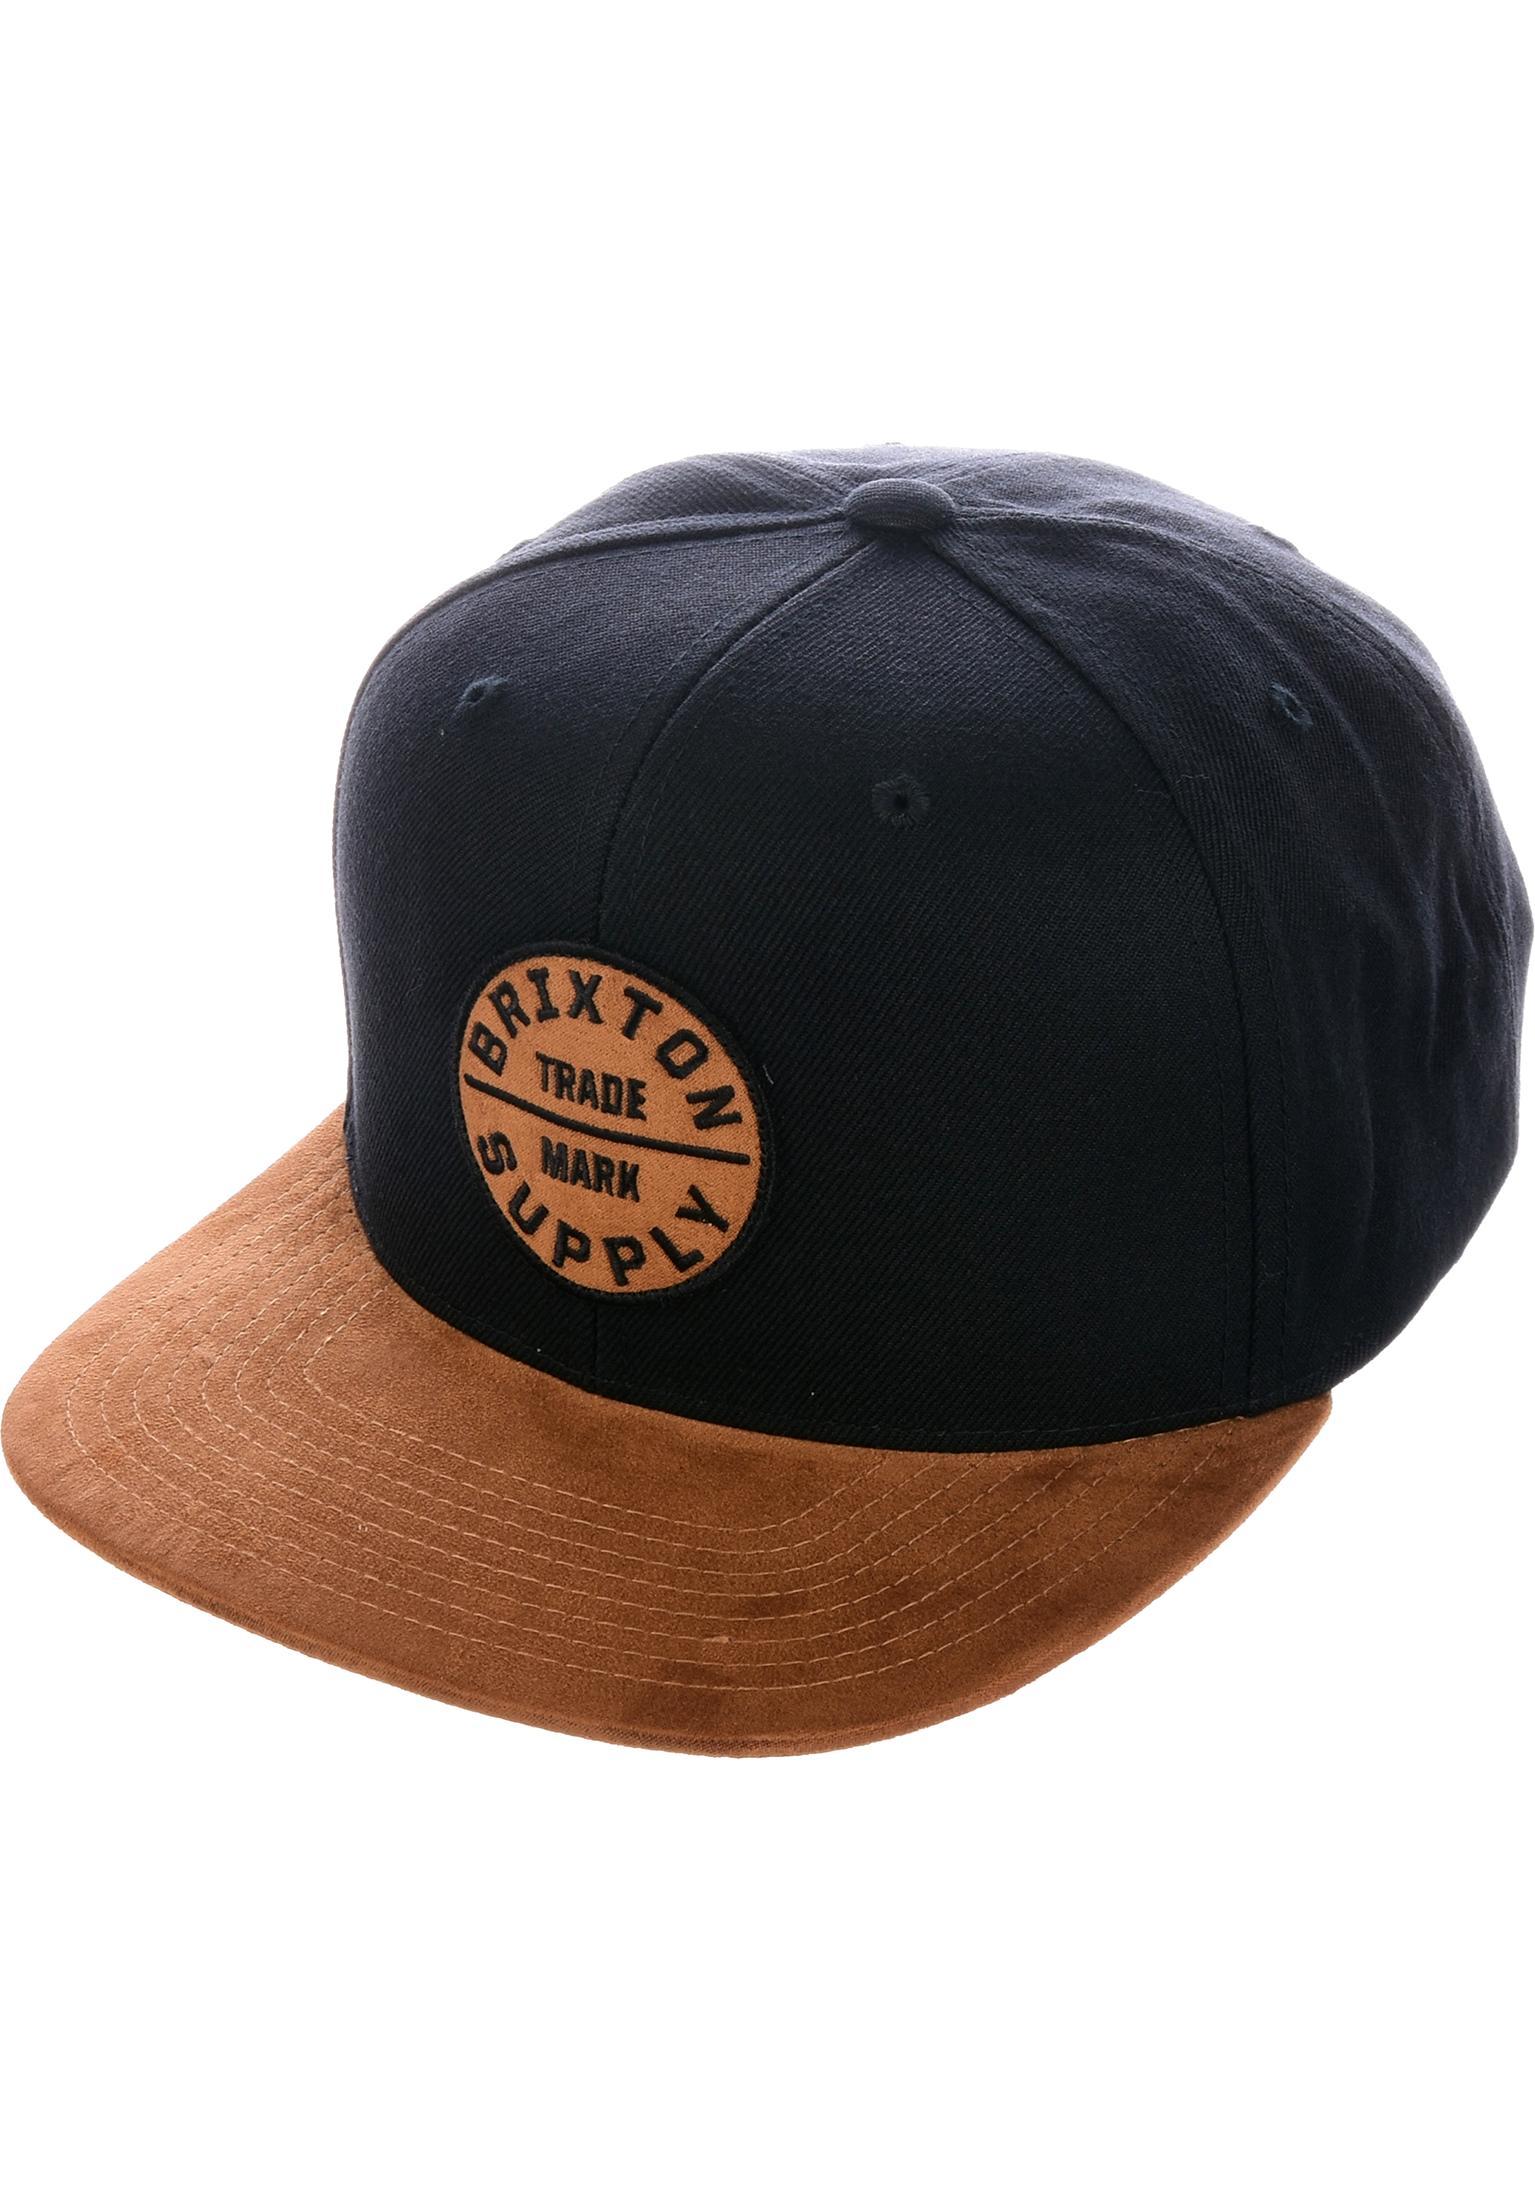 7c433337b73 Oath III Brixton Caps in copper-black for Men